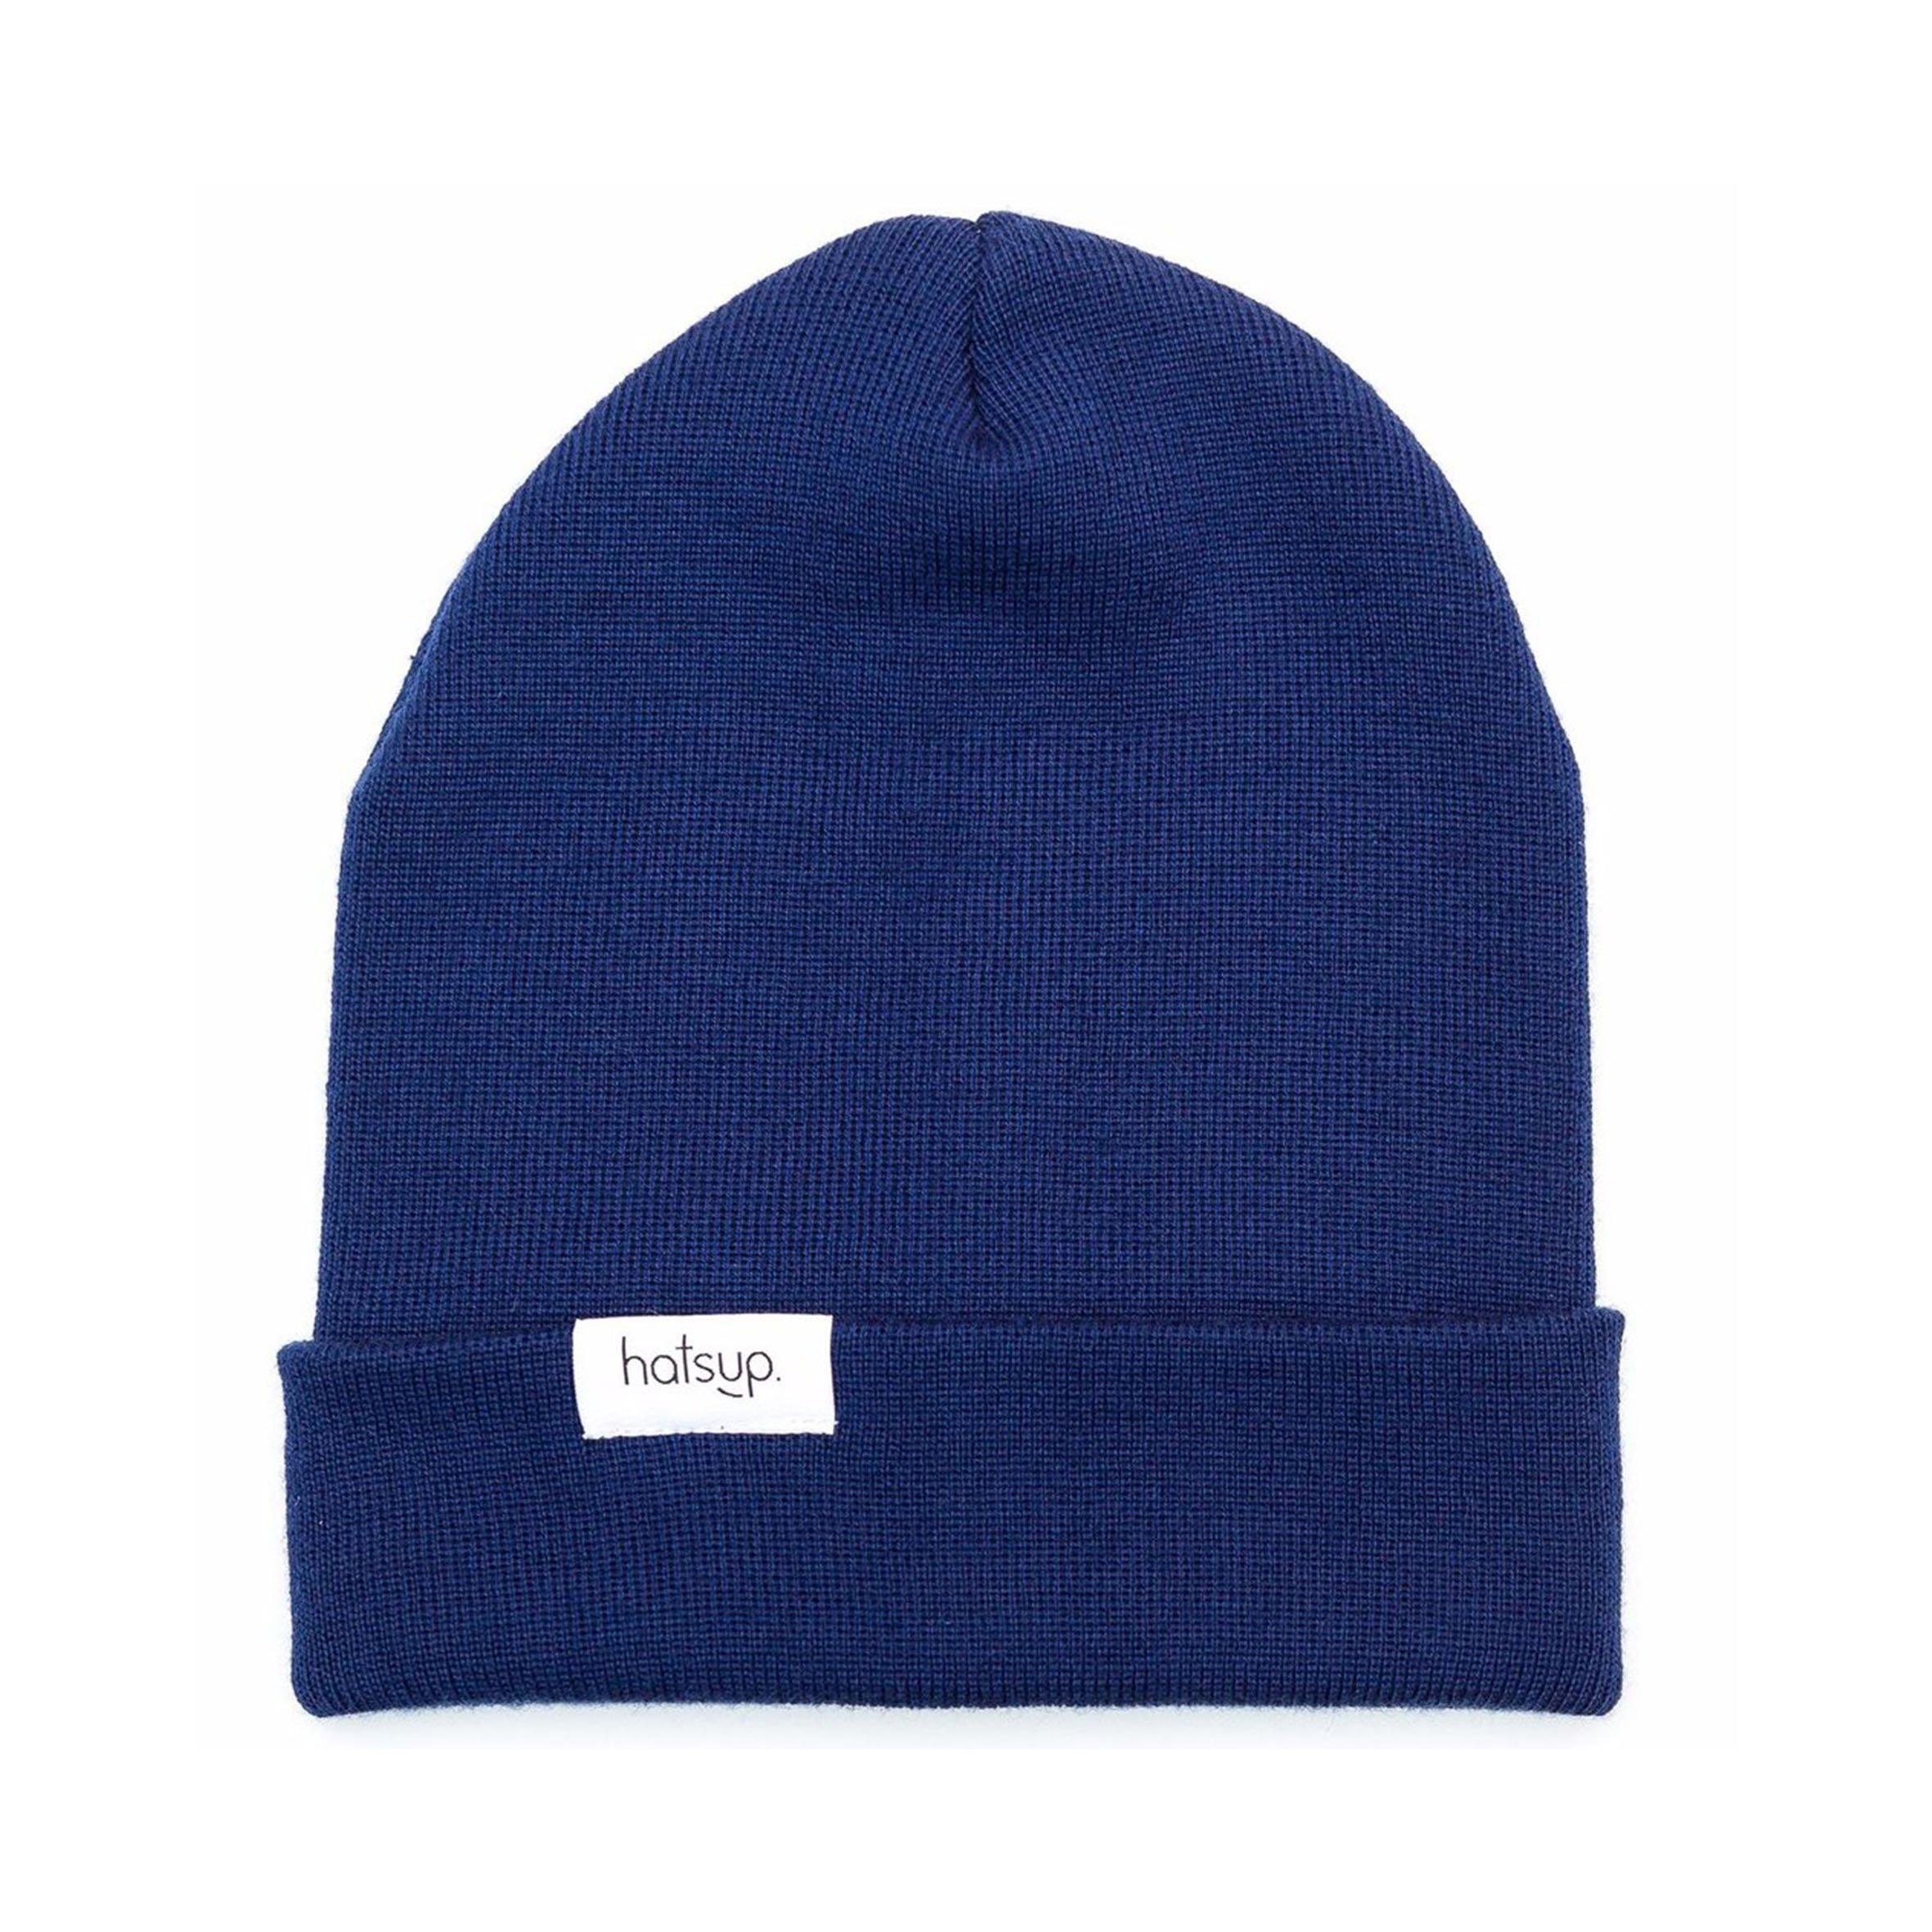 Beanie Marine Blue from hatsup